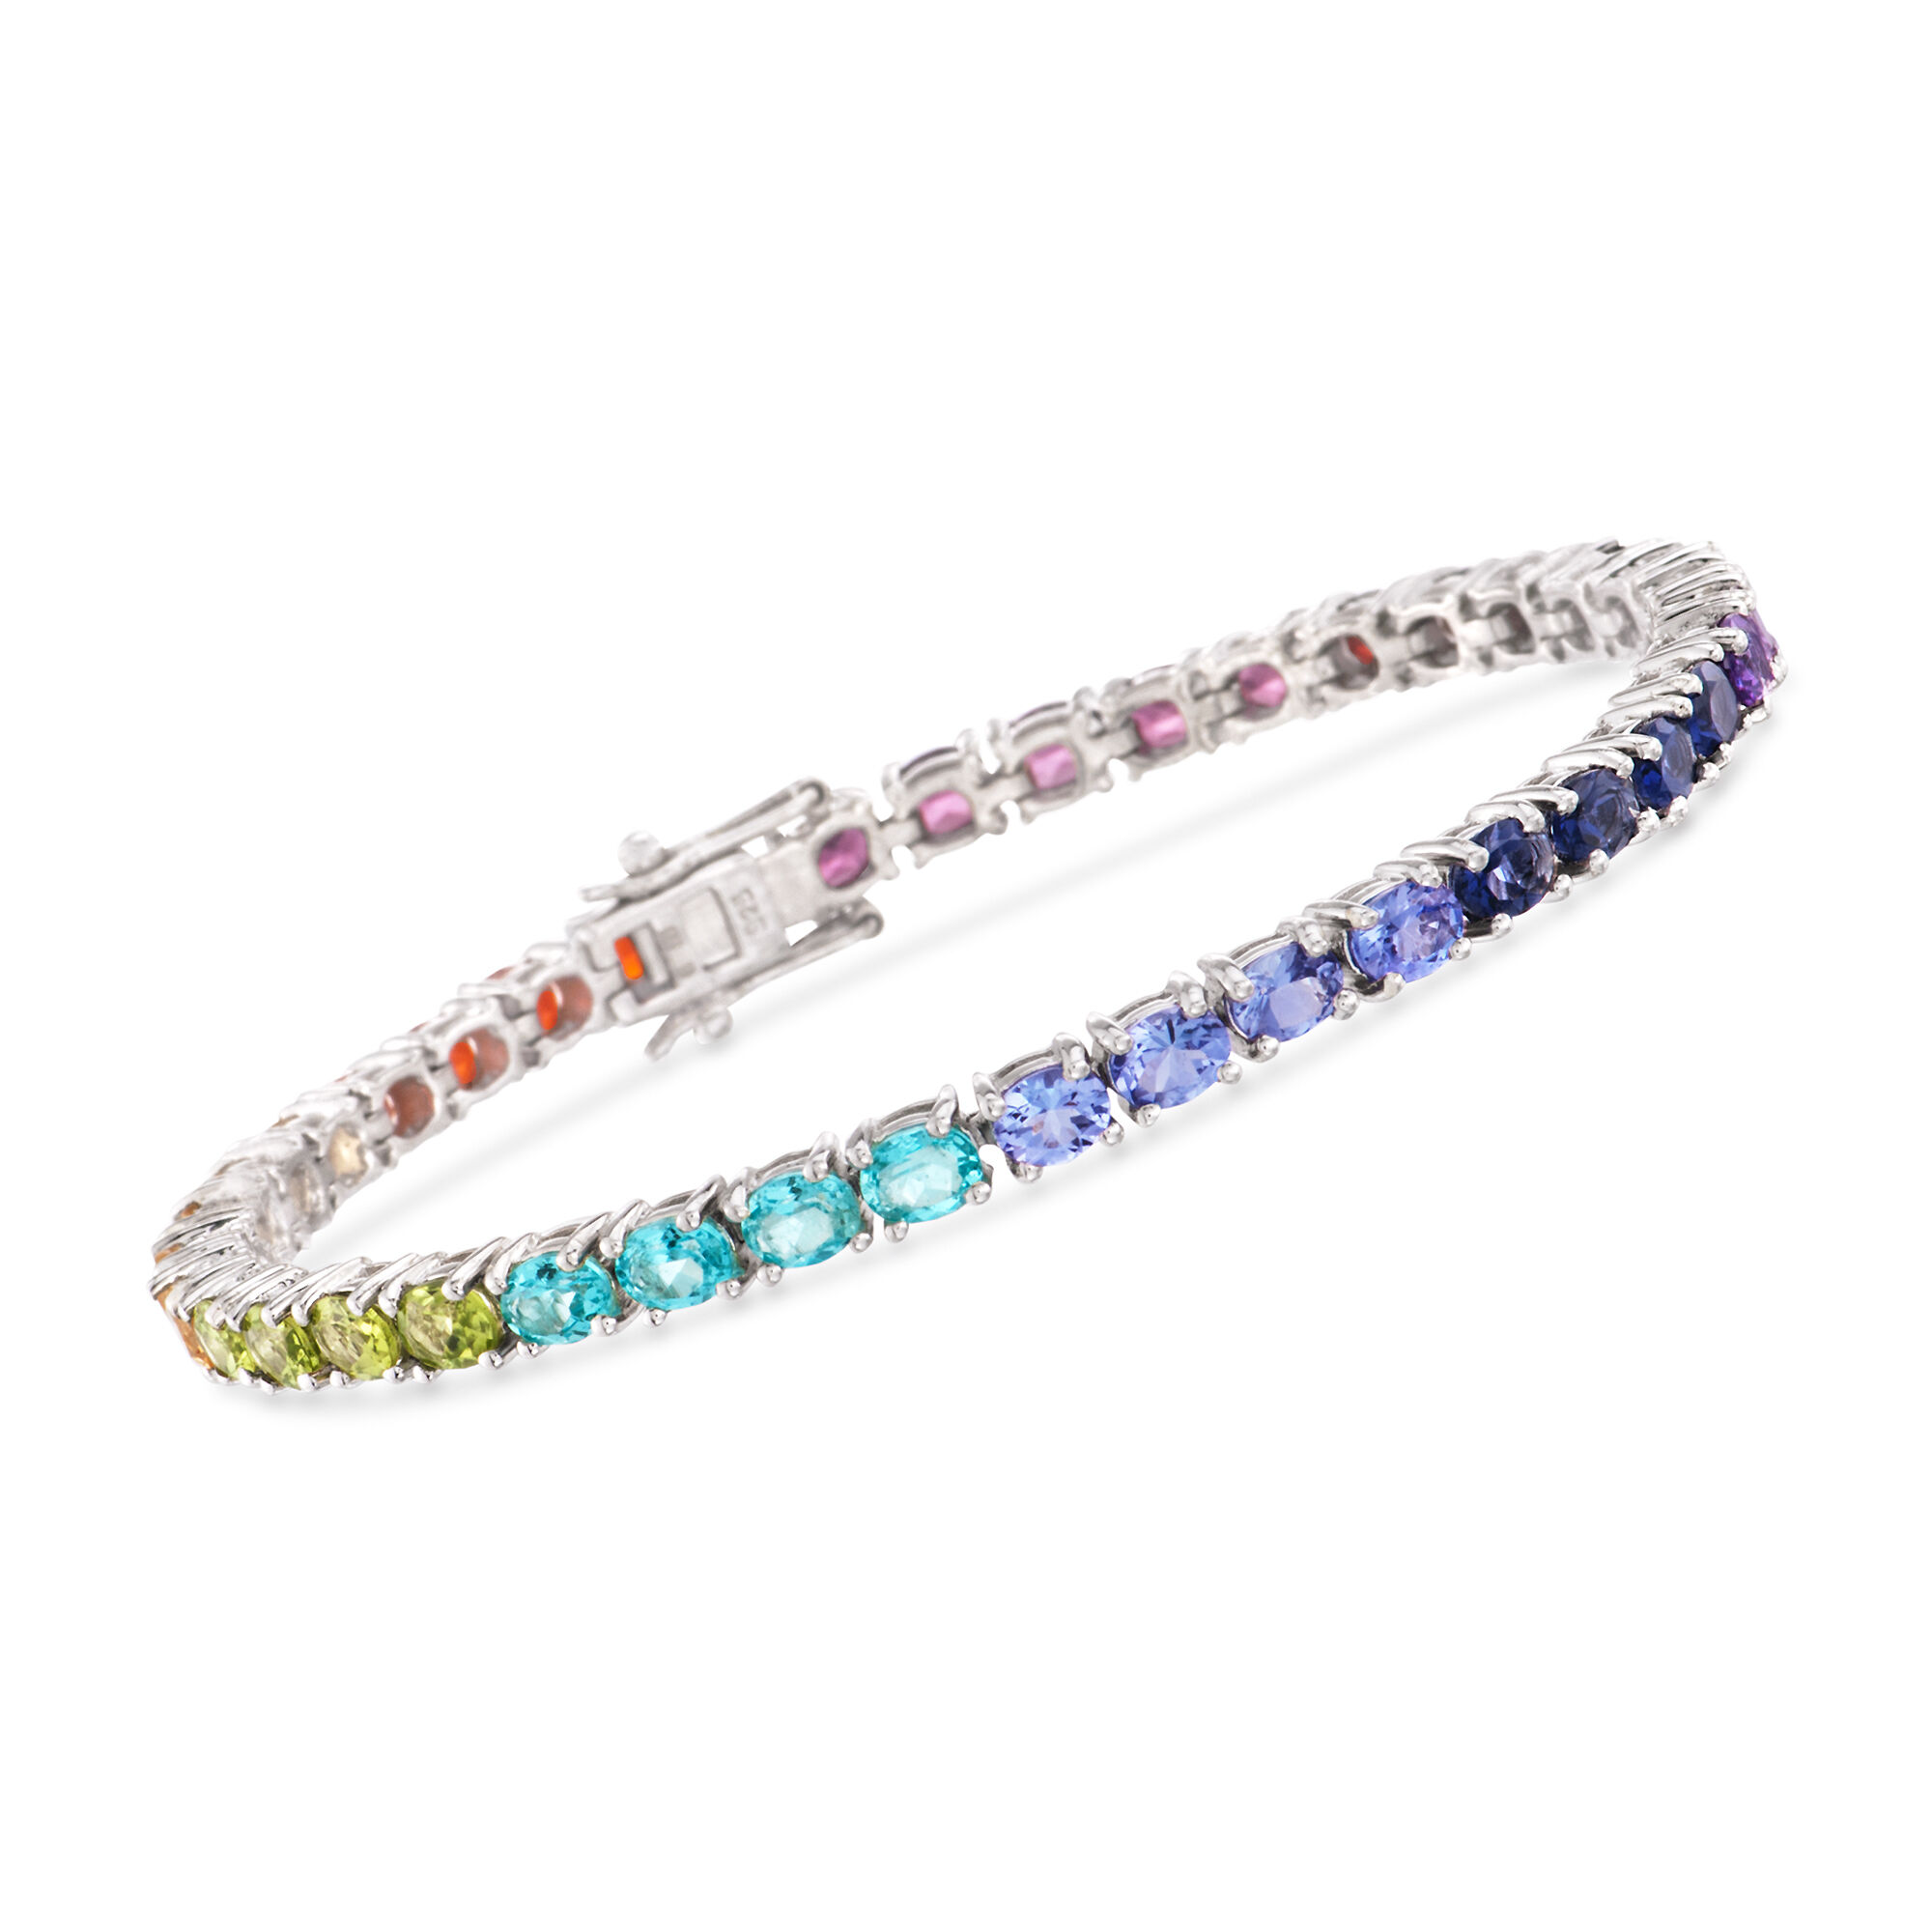 925 Sterling Silver Gemstone Ring Handmade Jewelry Size 5 6 7 8 9 10 11 12 ys194